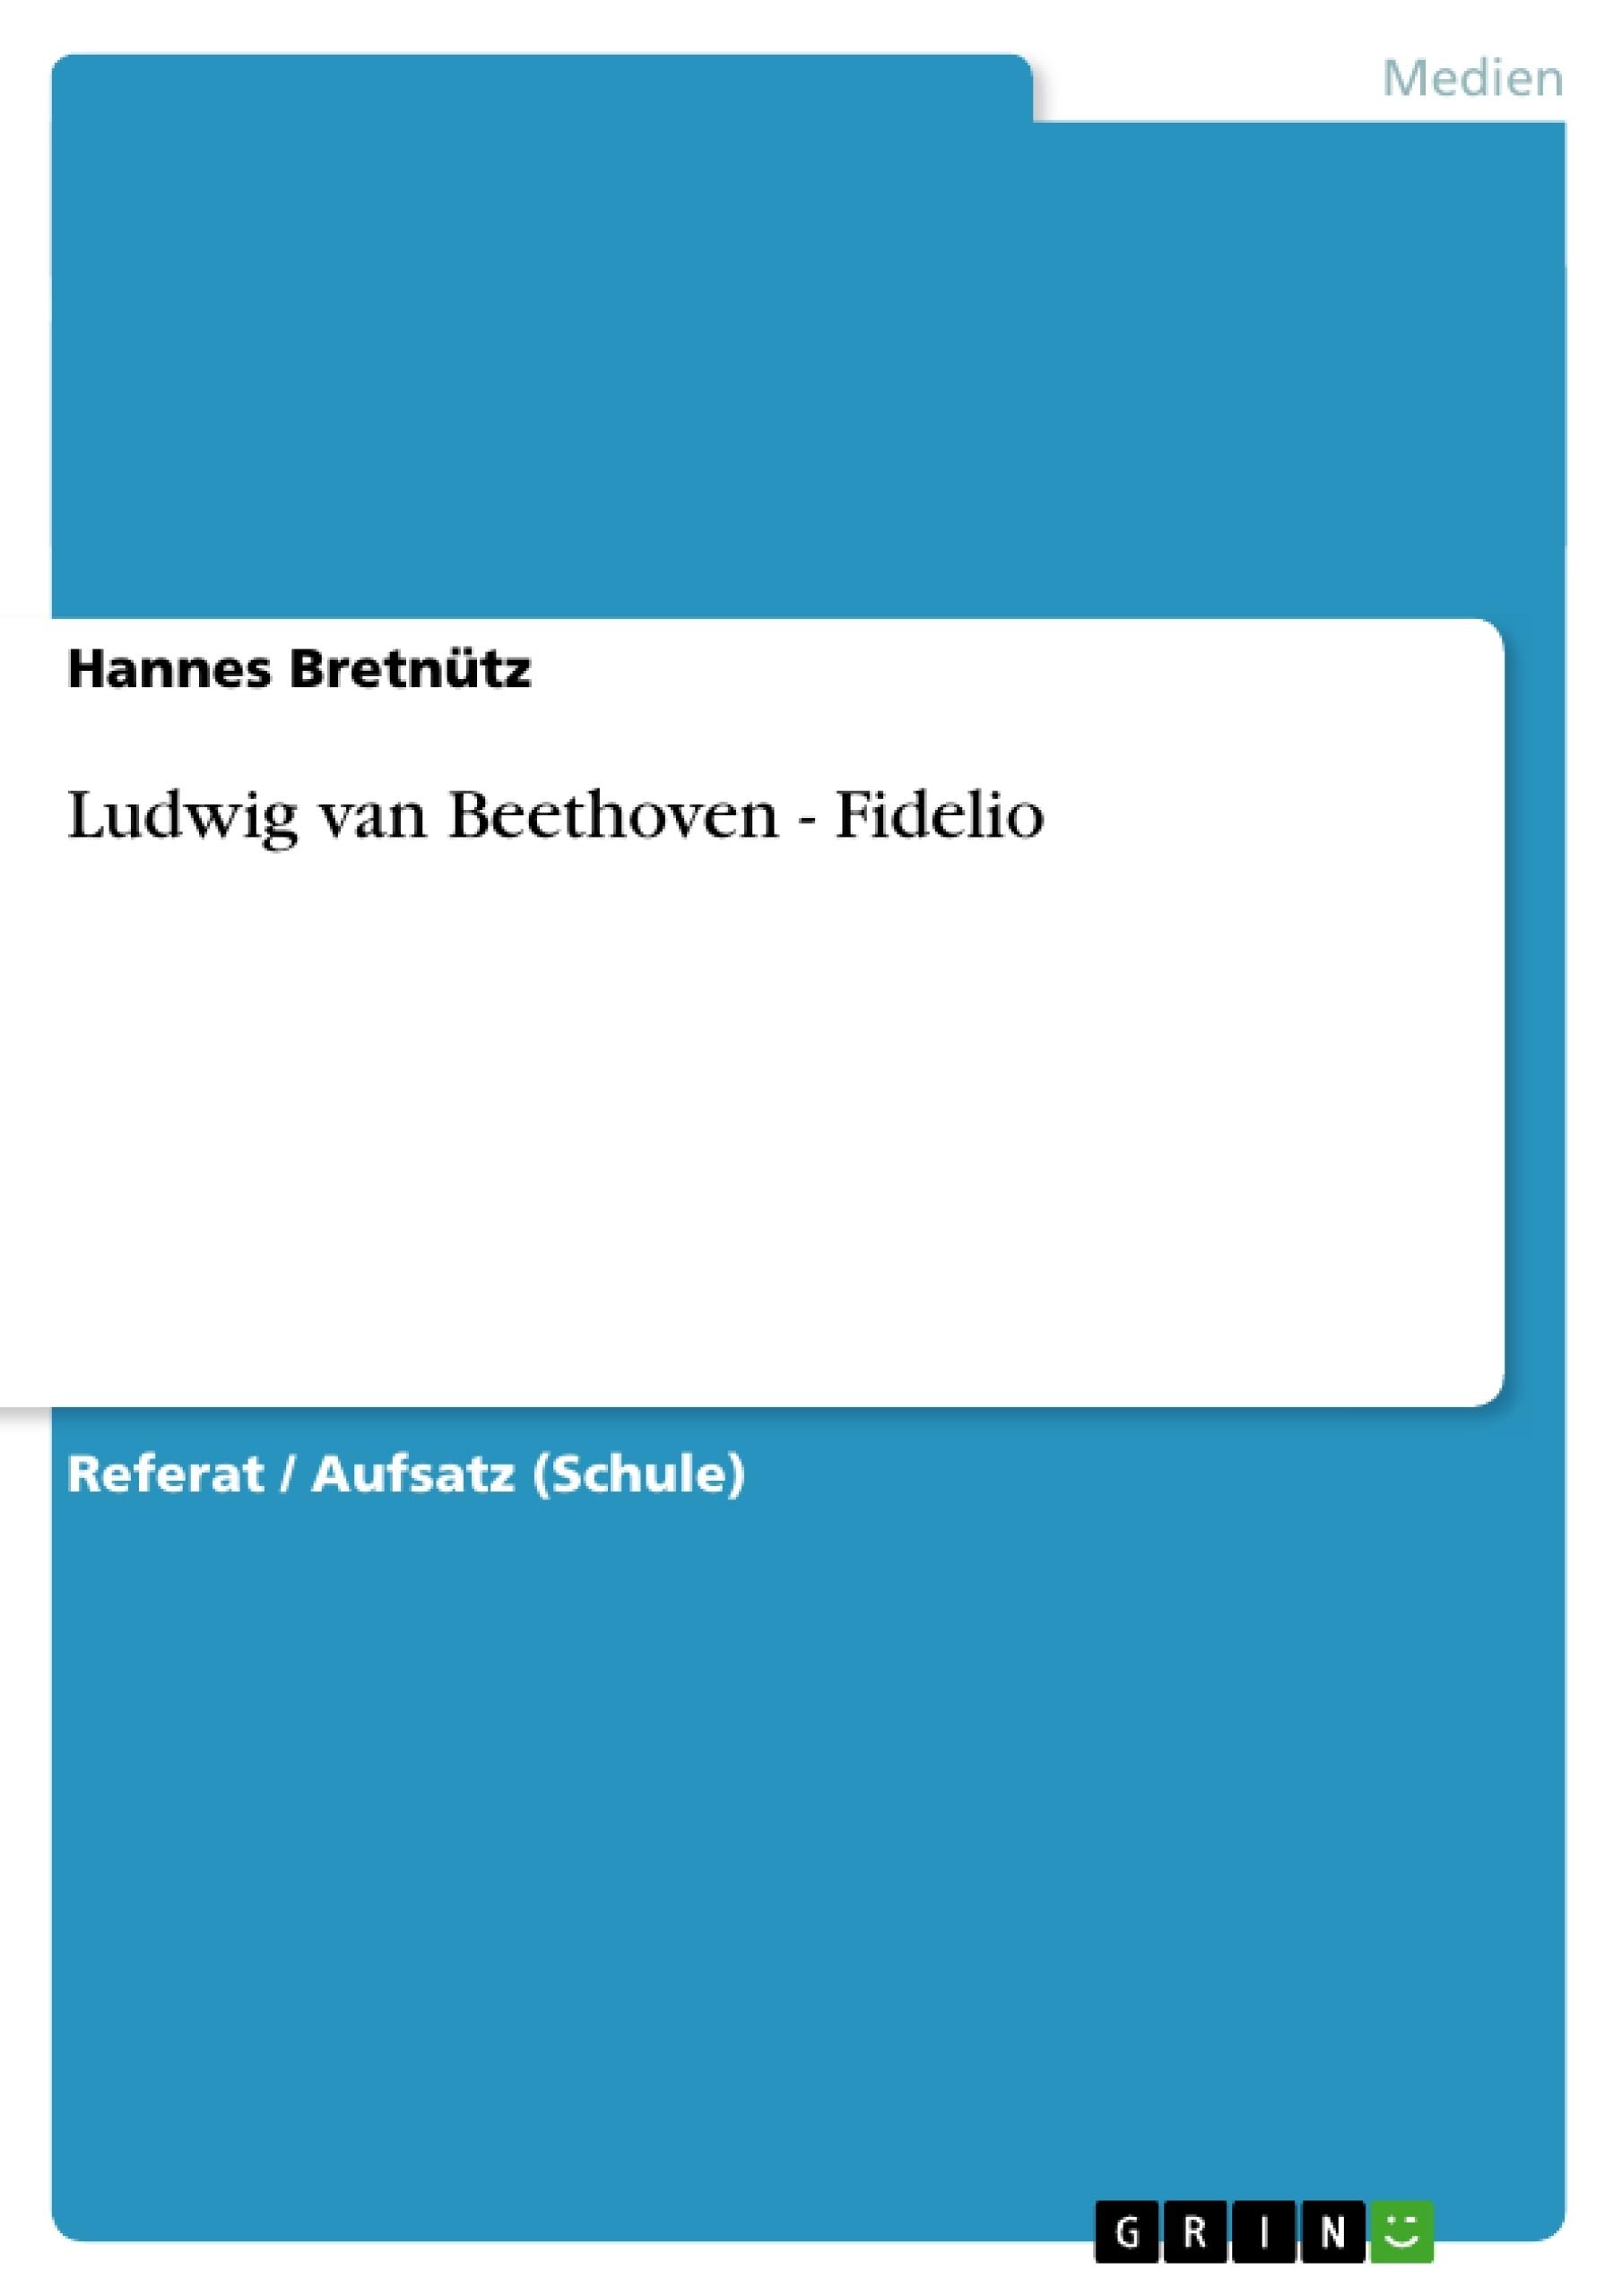 Titel: Ludwig van Beethoven - Fidelio